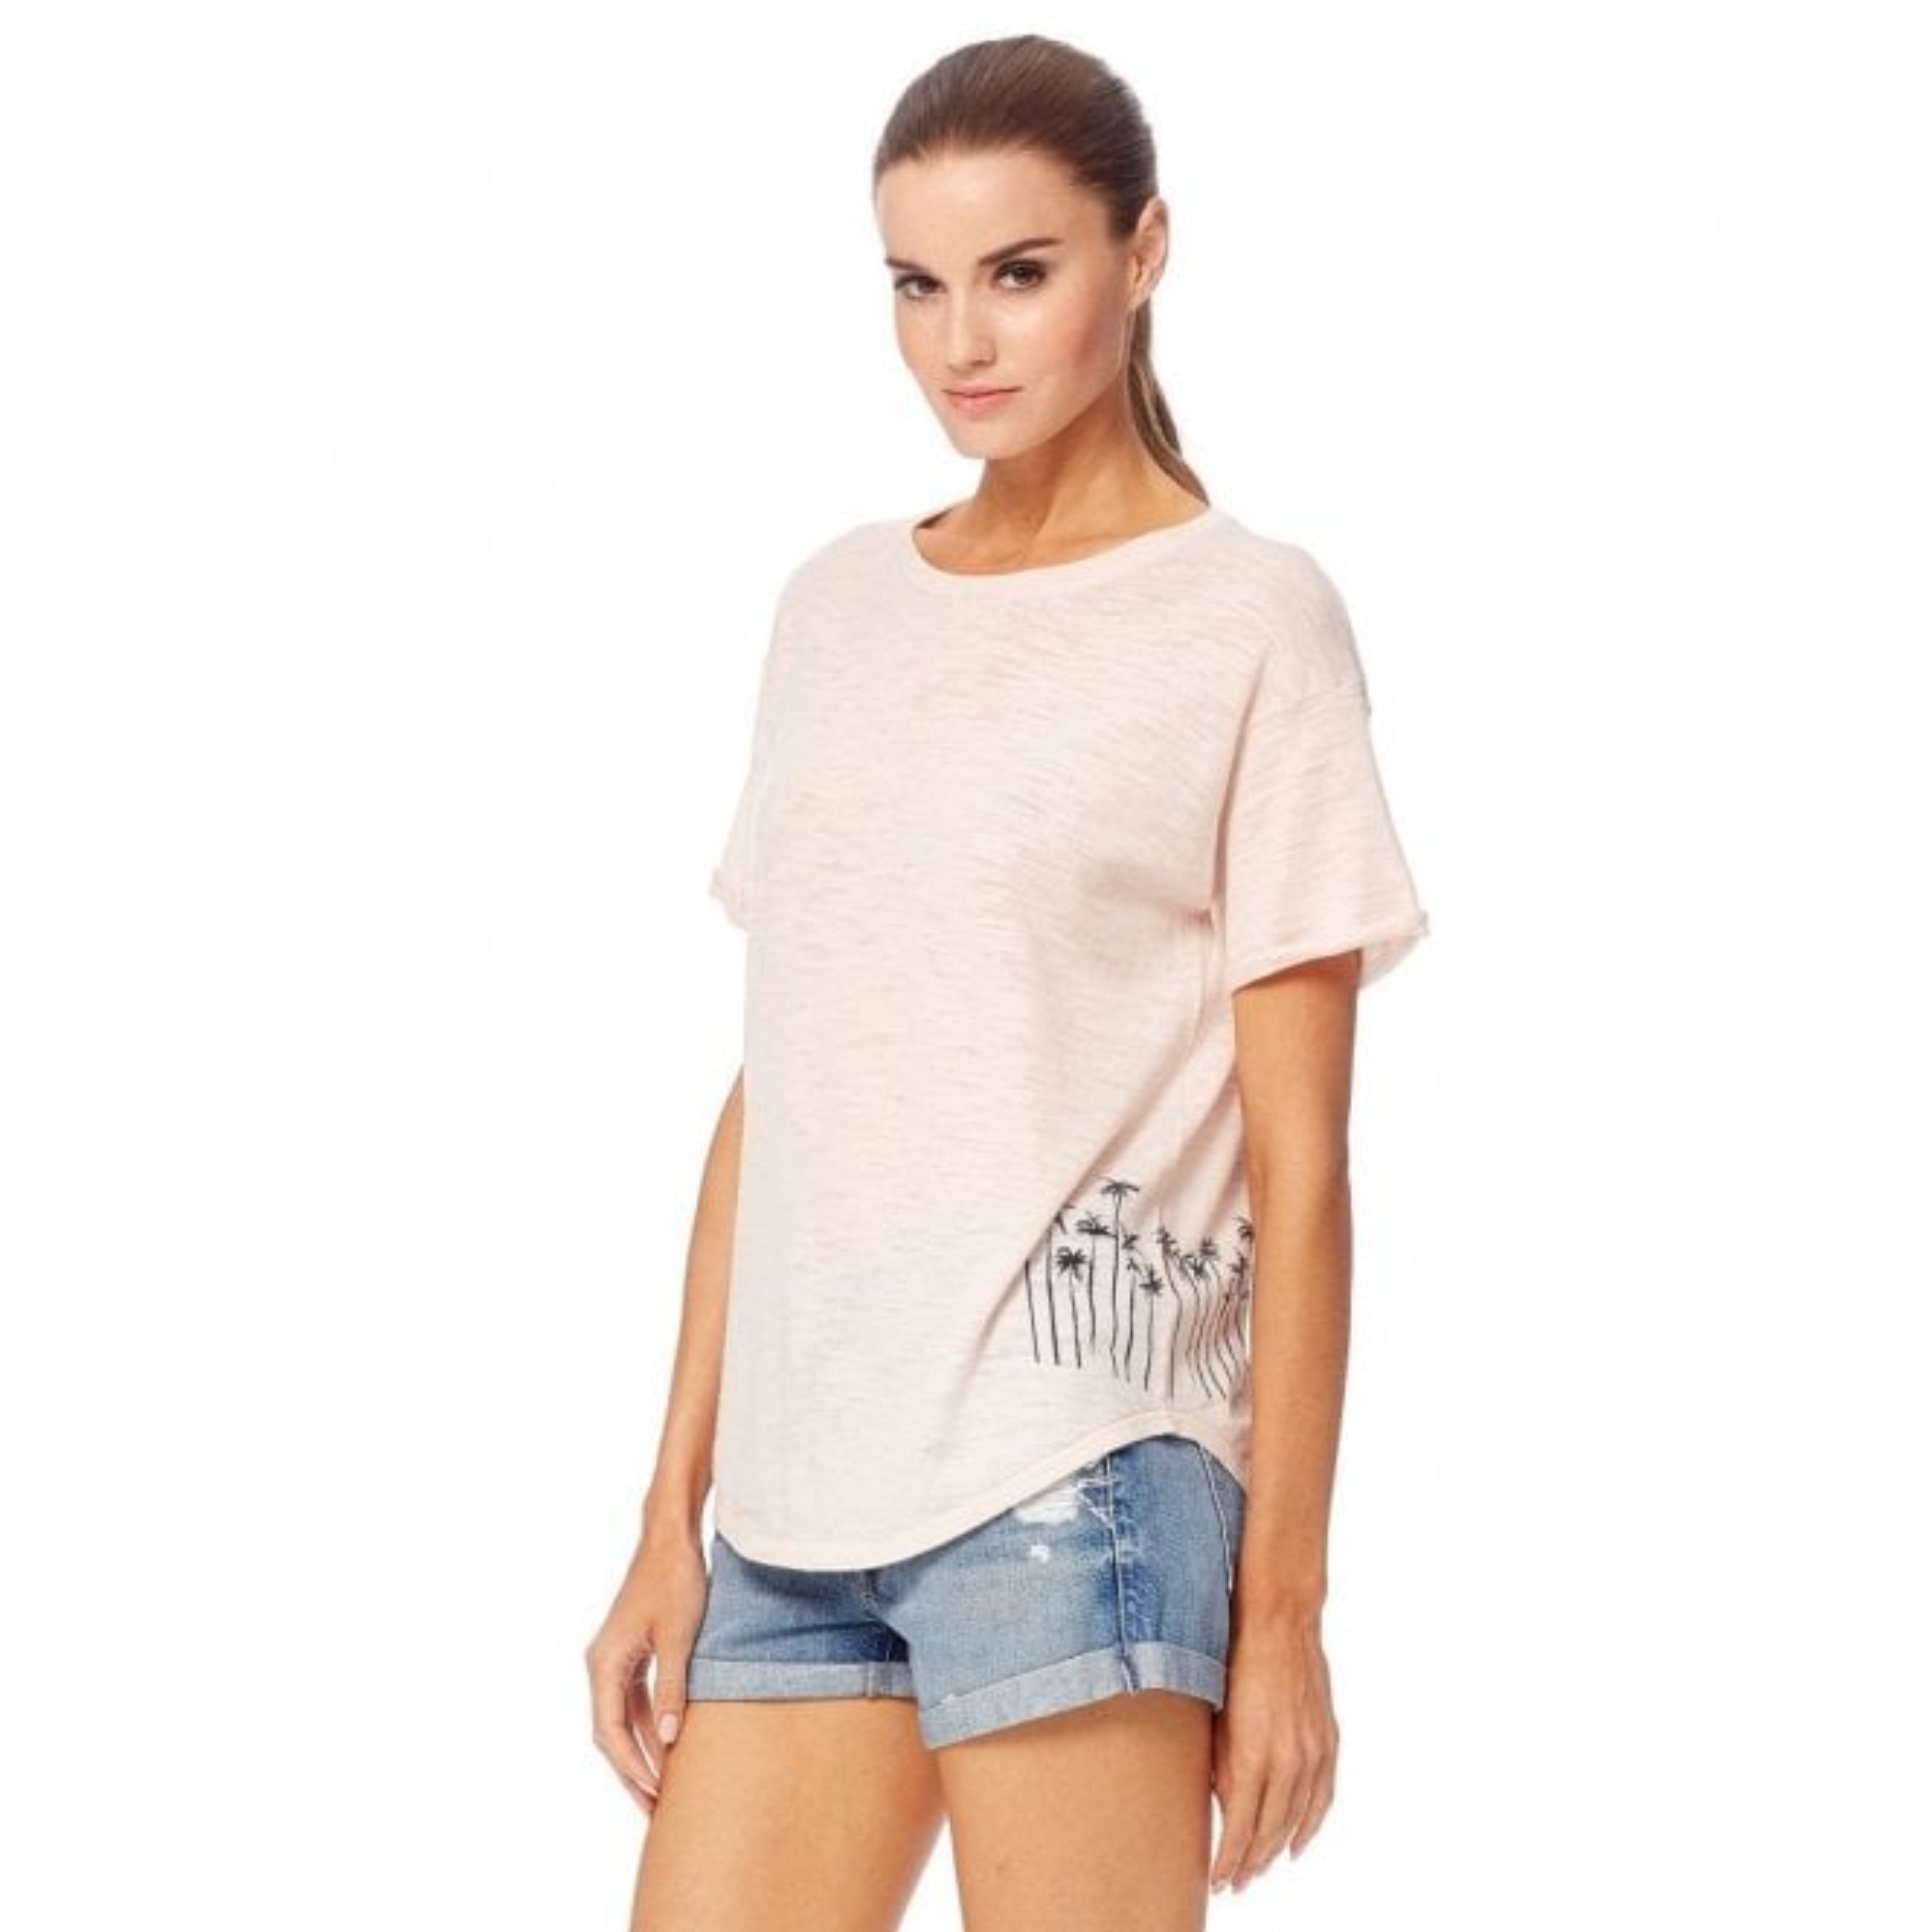 360 Sweater Marielle Cotton Slub T-Shirt in Ballet